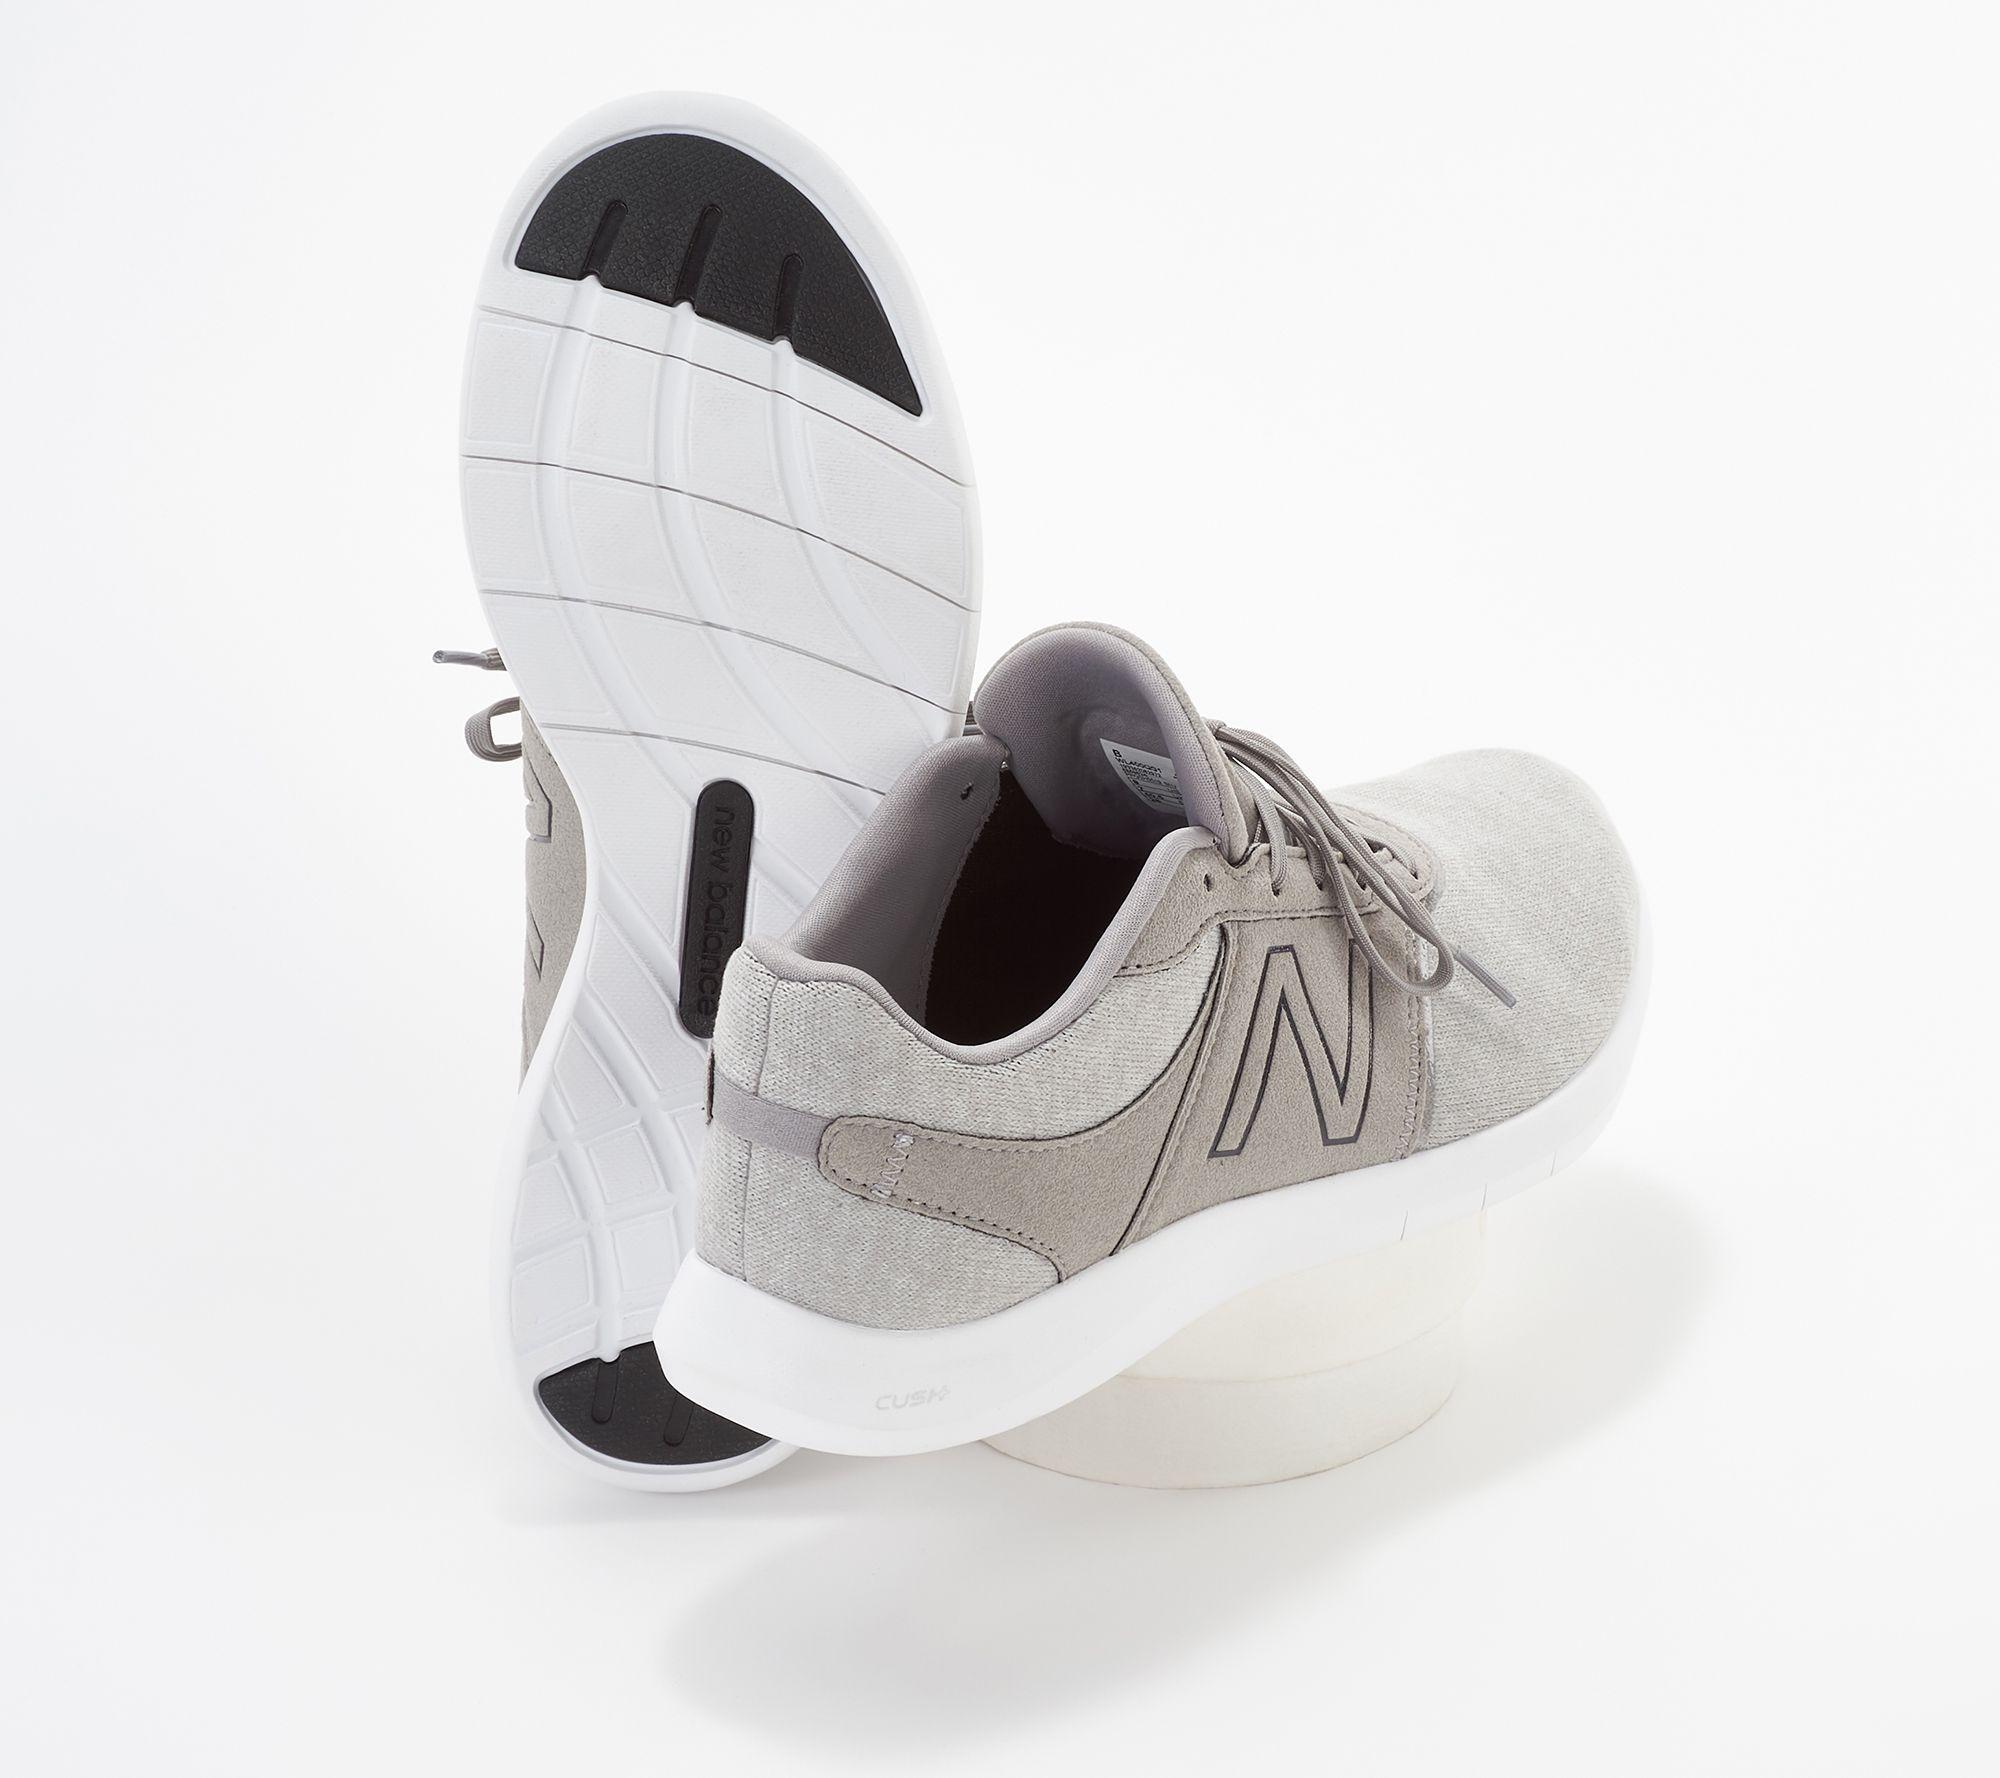 6e8b93932fedb New Balance x Isaac Mizrahi Live! Sweater Lace-Up Sneakers - 400 - Page 1 —  QVC.com